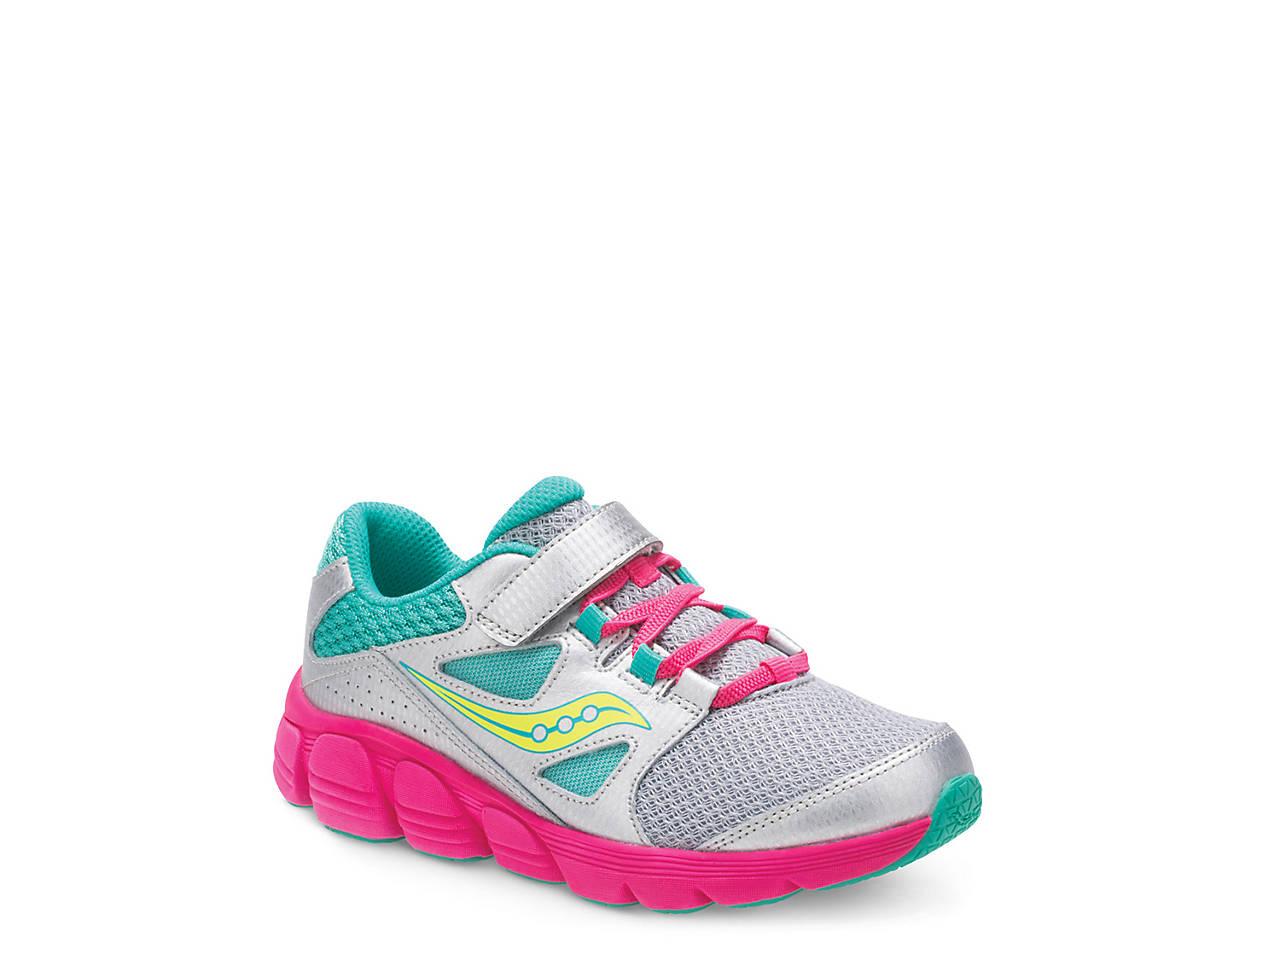 15ac93f7a0 Kotaro 4 Toddler & Youth Sneaker